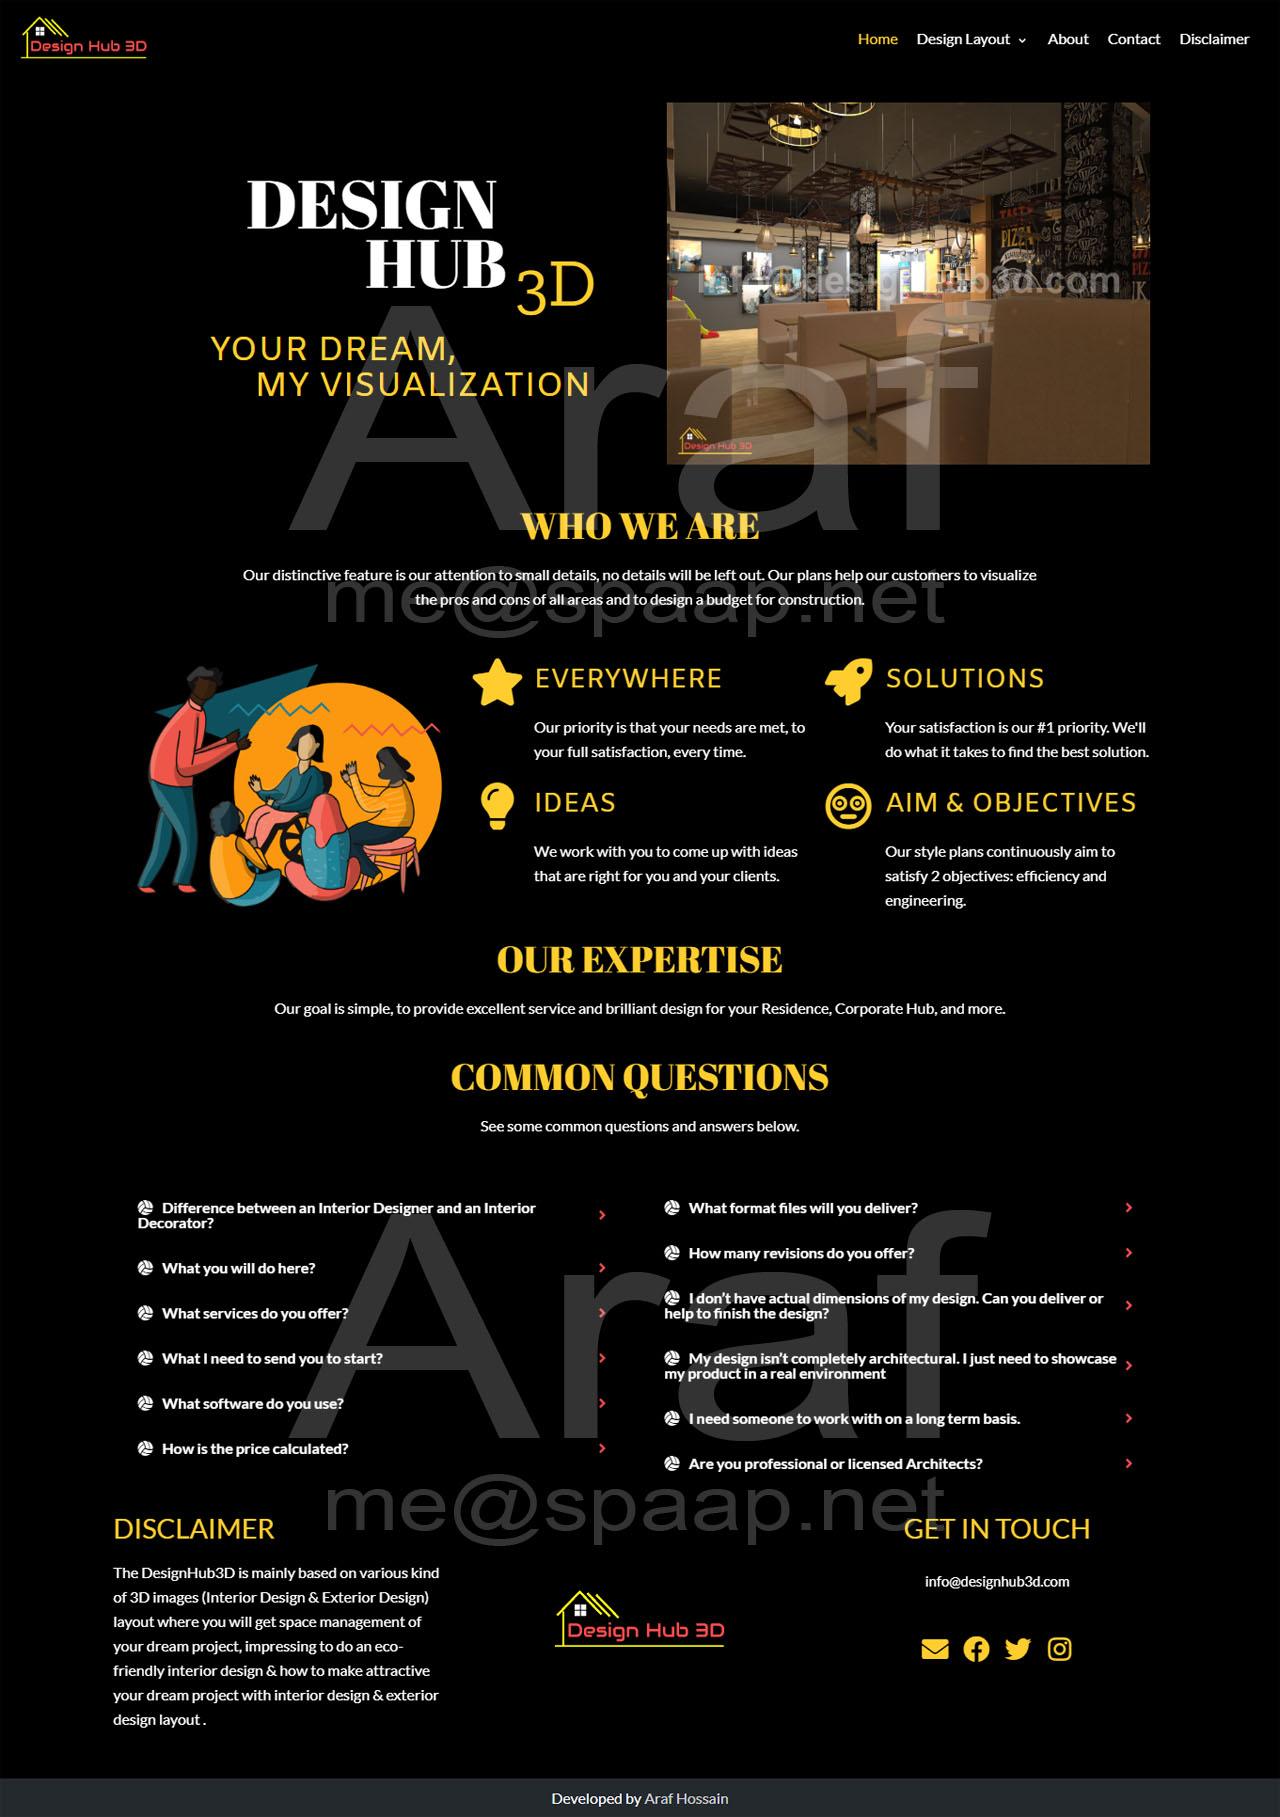 Araf Hossain - DesignHub 3D